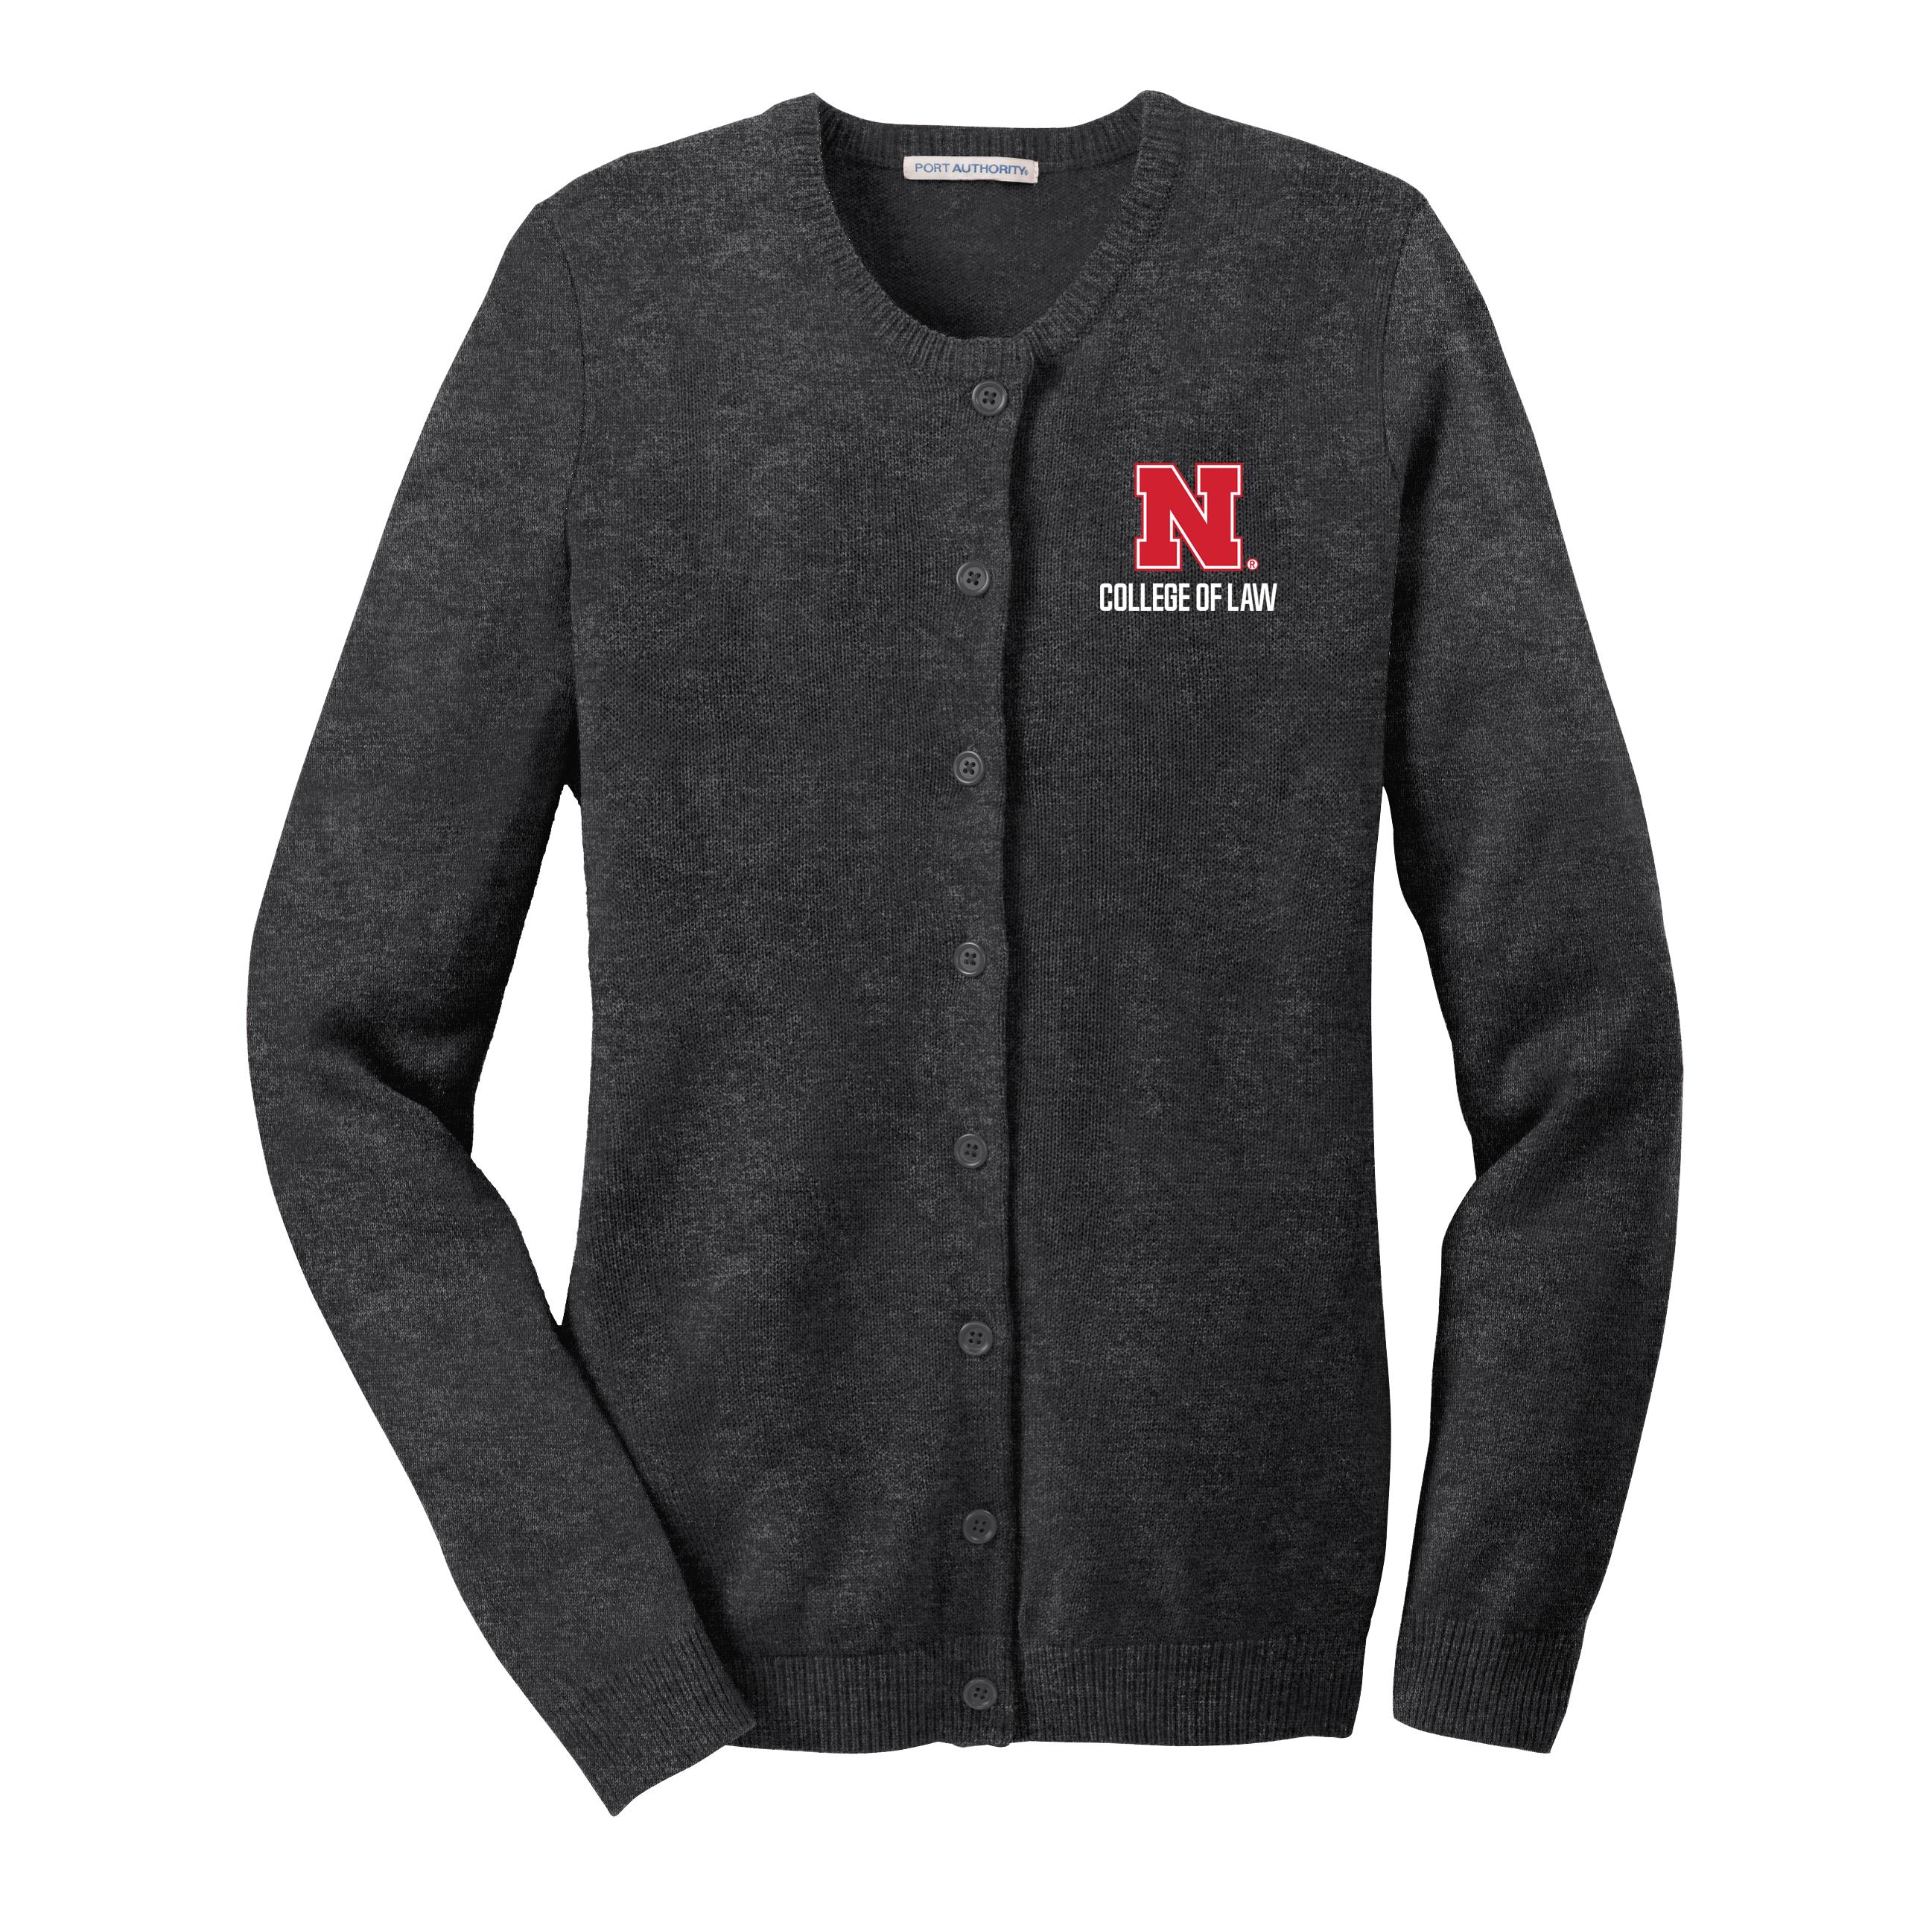 9cd109a52c8 Ladies Jewel Neck Cardigan Sweater - Nebraska College of Law